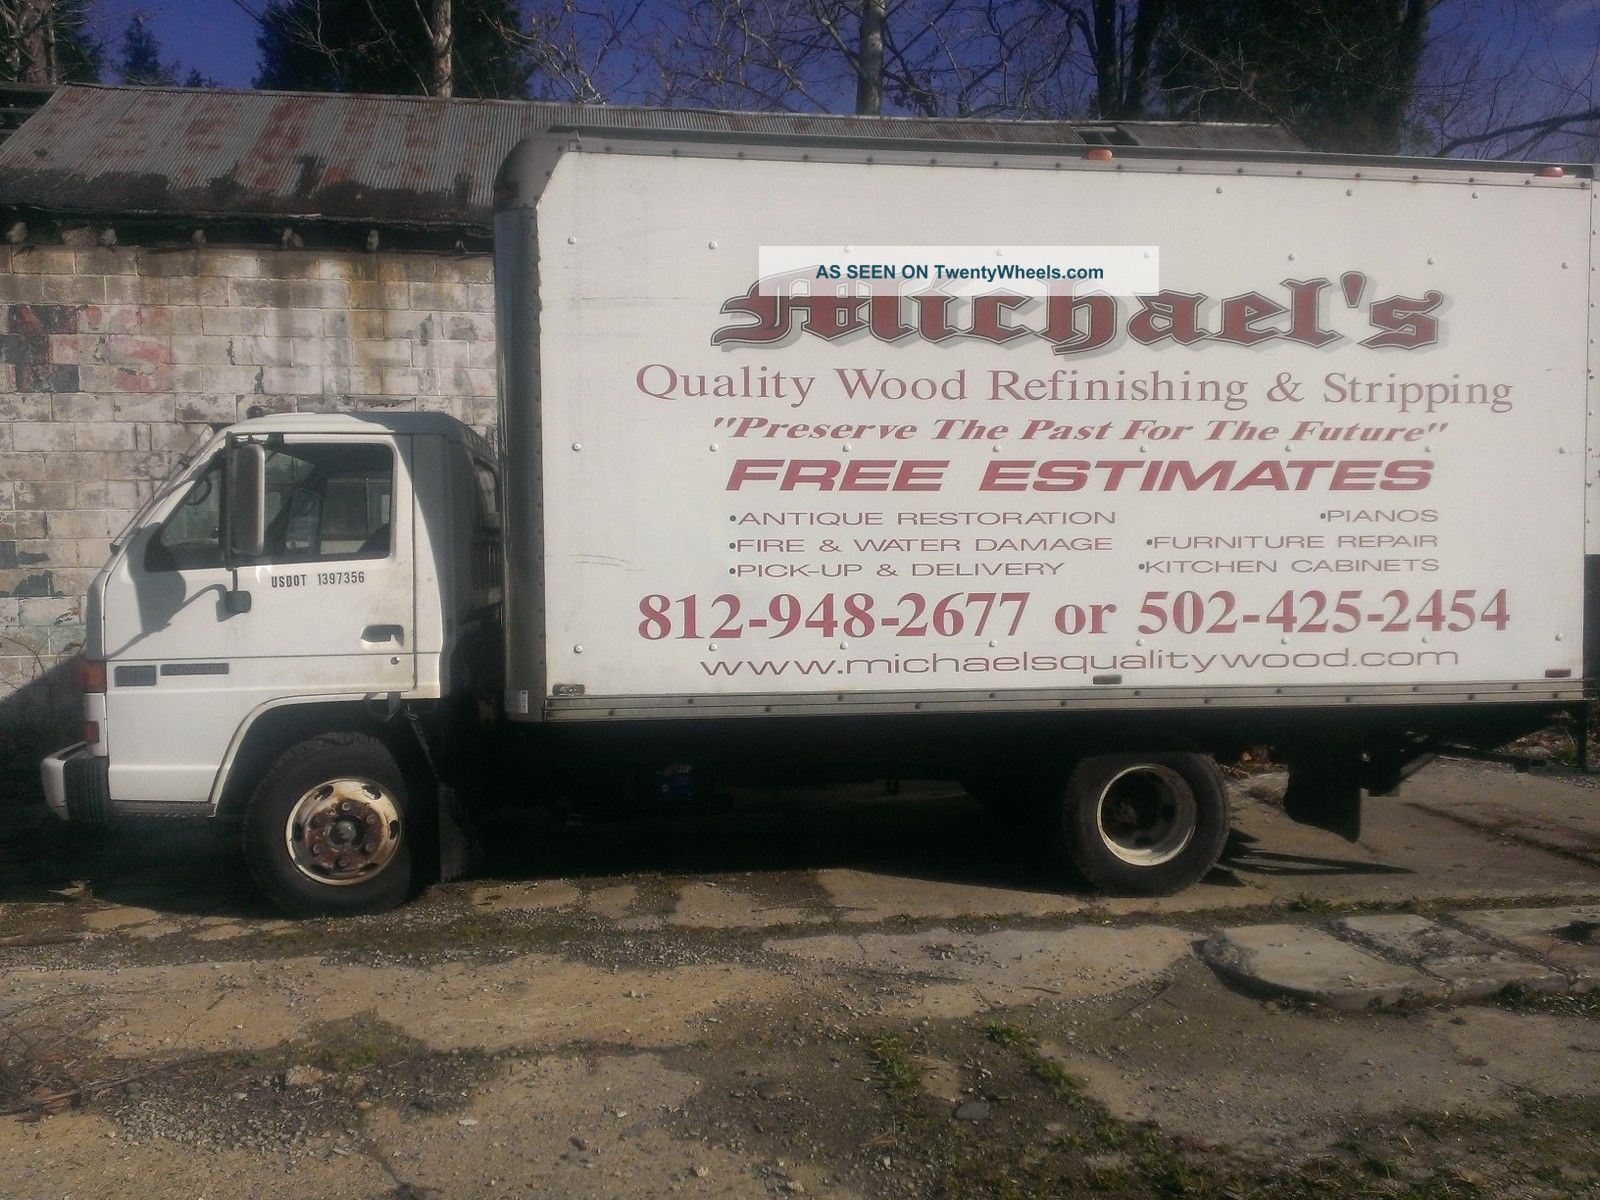 1993 gmc isuzu npr 4000 box trucks / cube vans photo